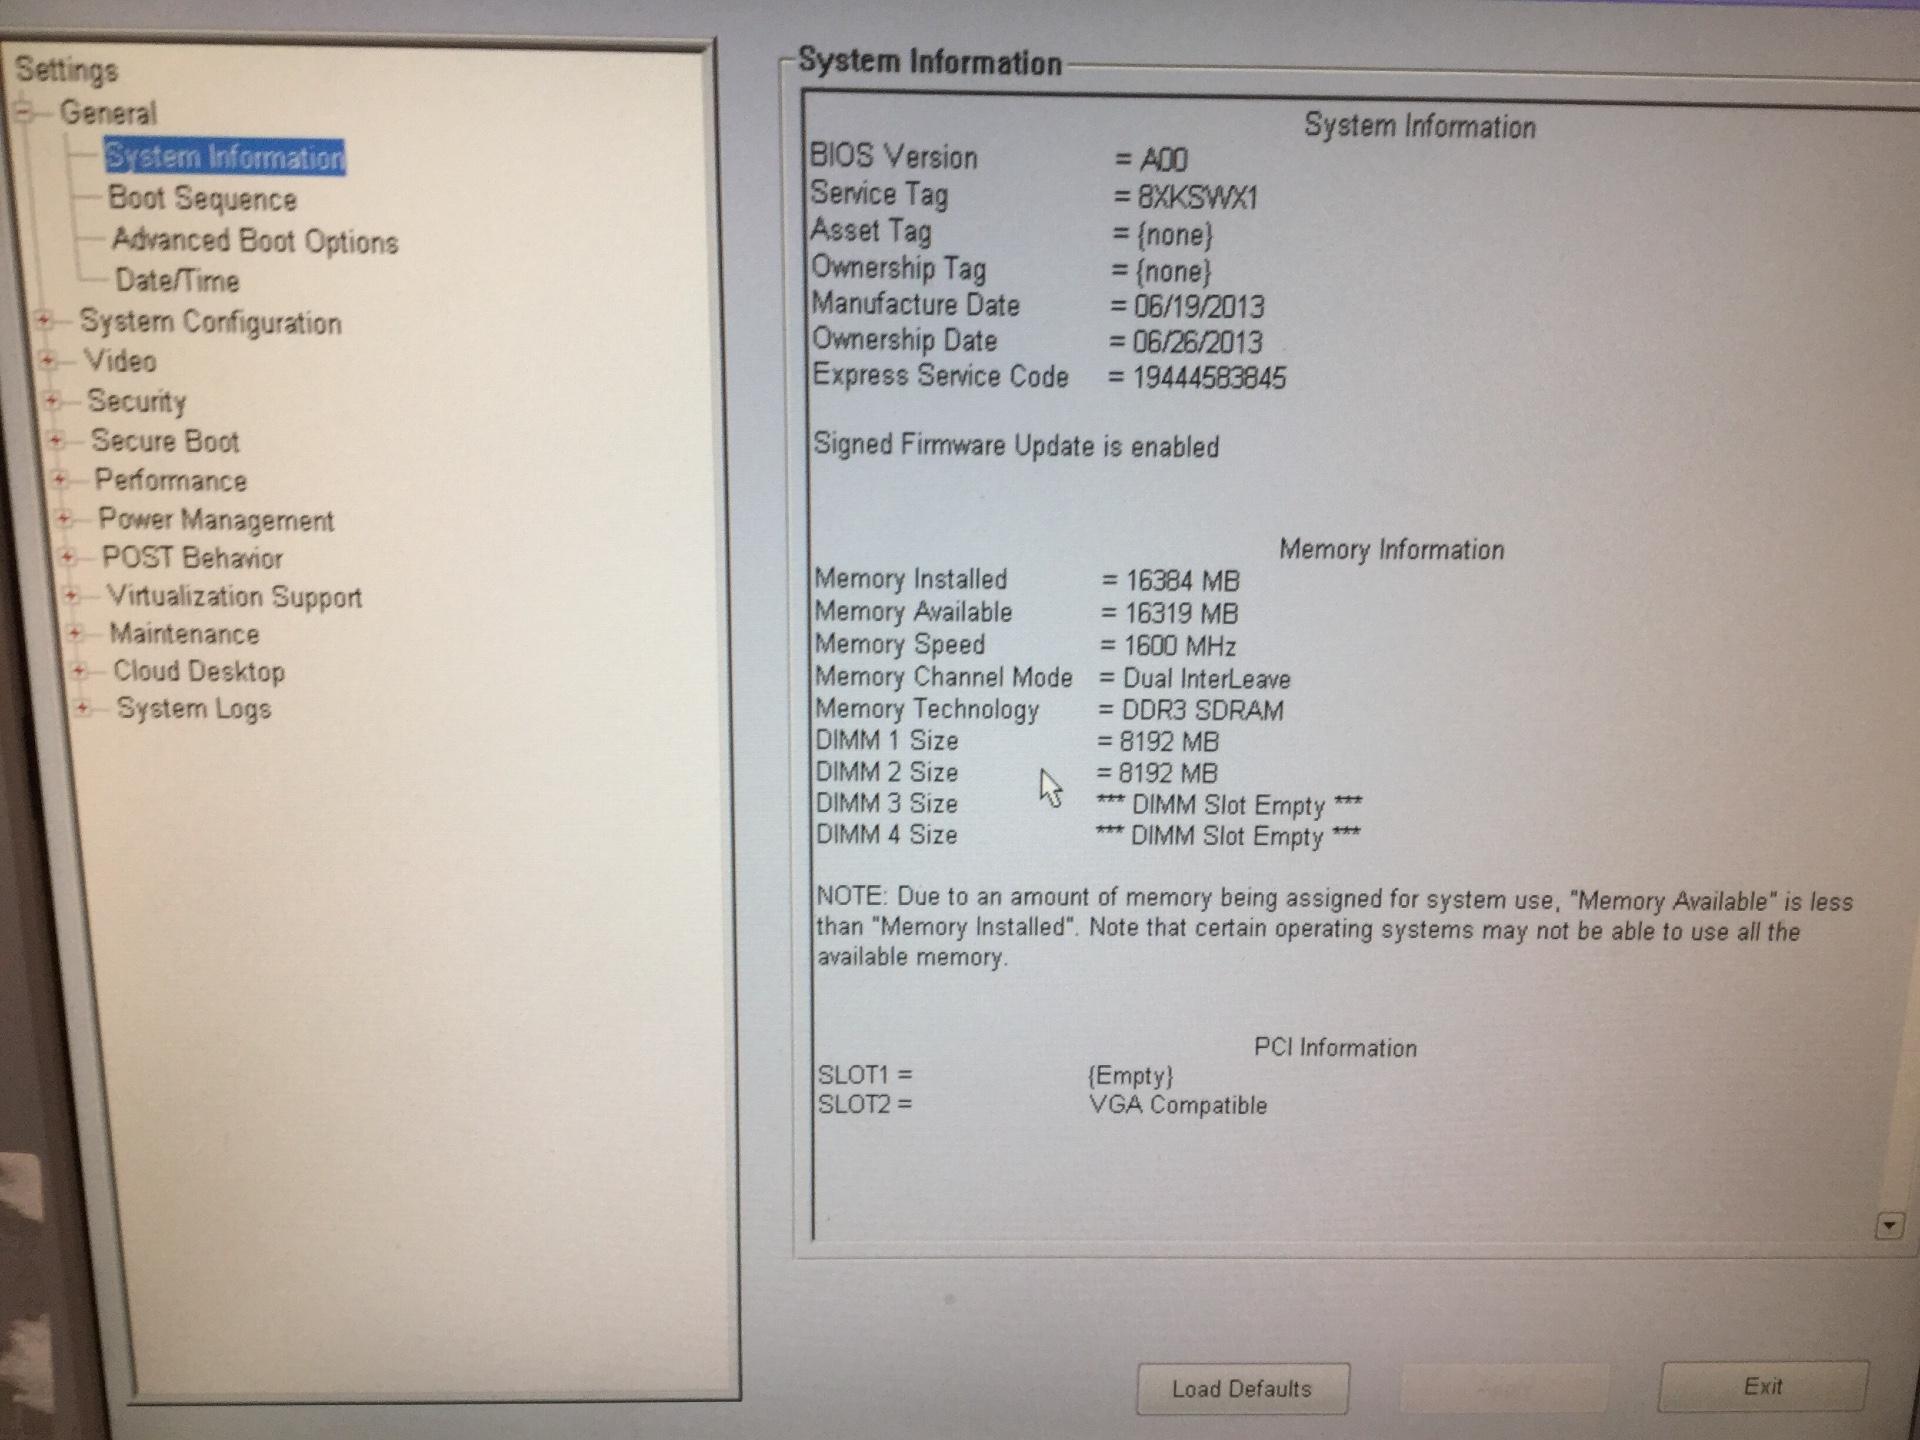 Desktop, Dell Optiplex 9020, Appears to Function